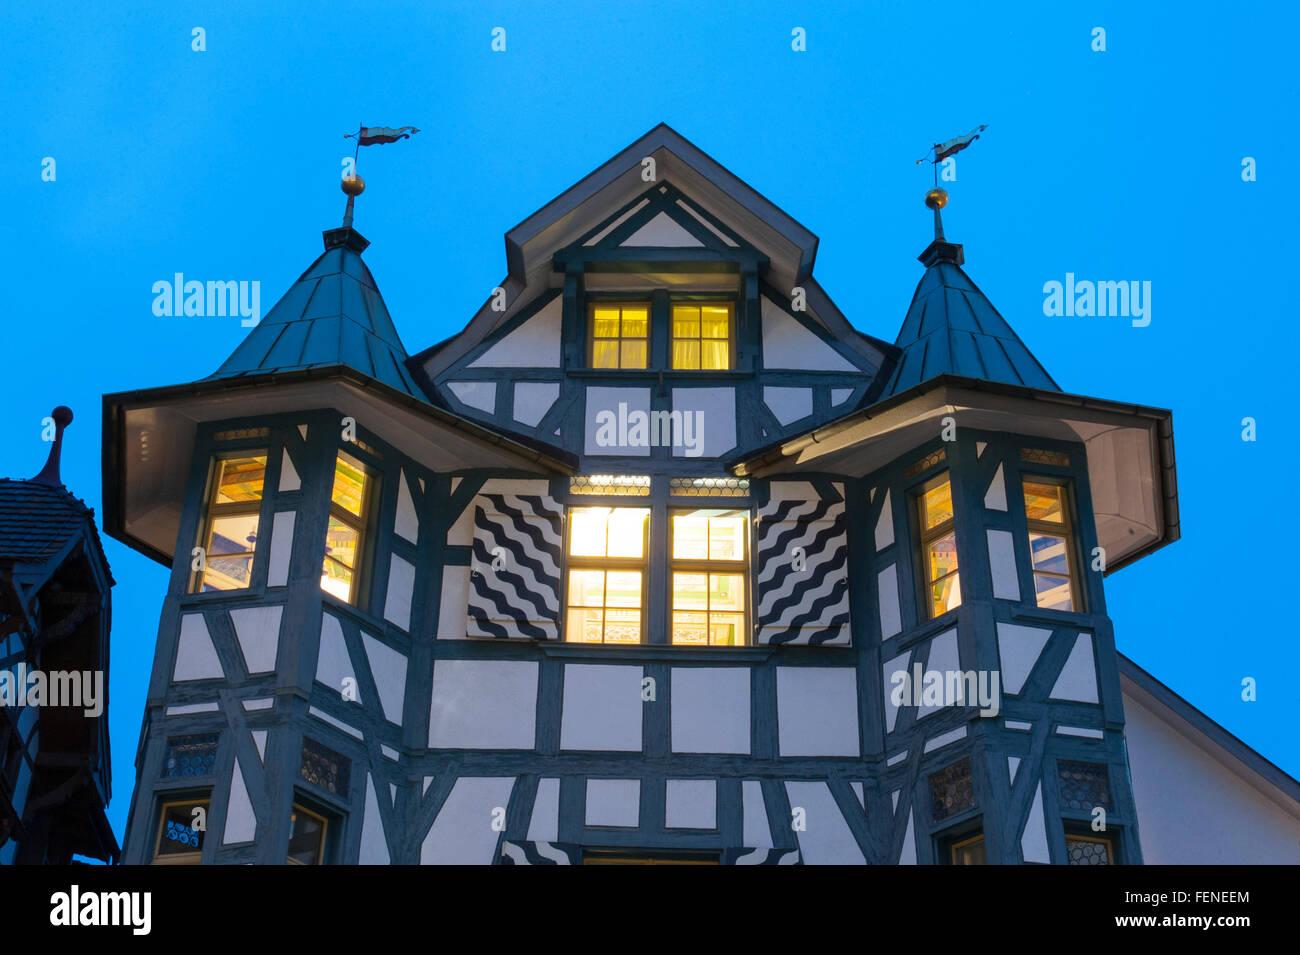 Altstadt bei Dämmerung, St. Gallen, Kanton St. Gallen, Schweiz | old town at dusk, St. Gallen, Canton of St. - Stock Image